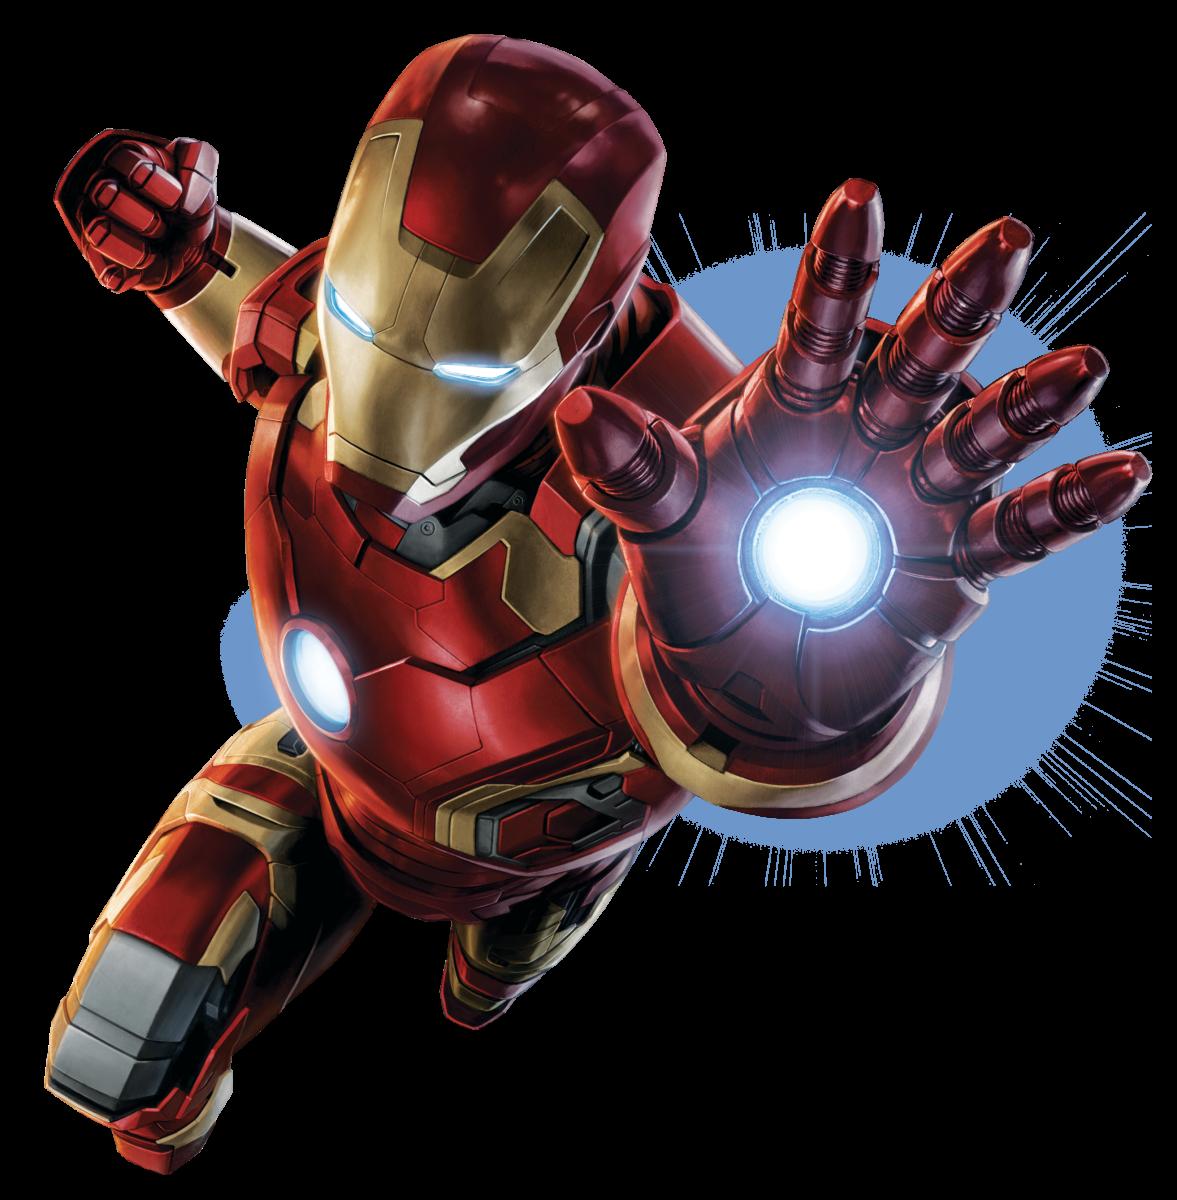 Iron Man - Avengers Assemble